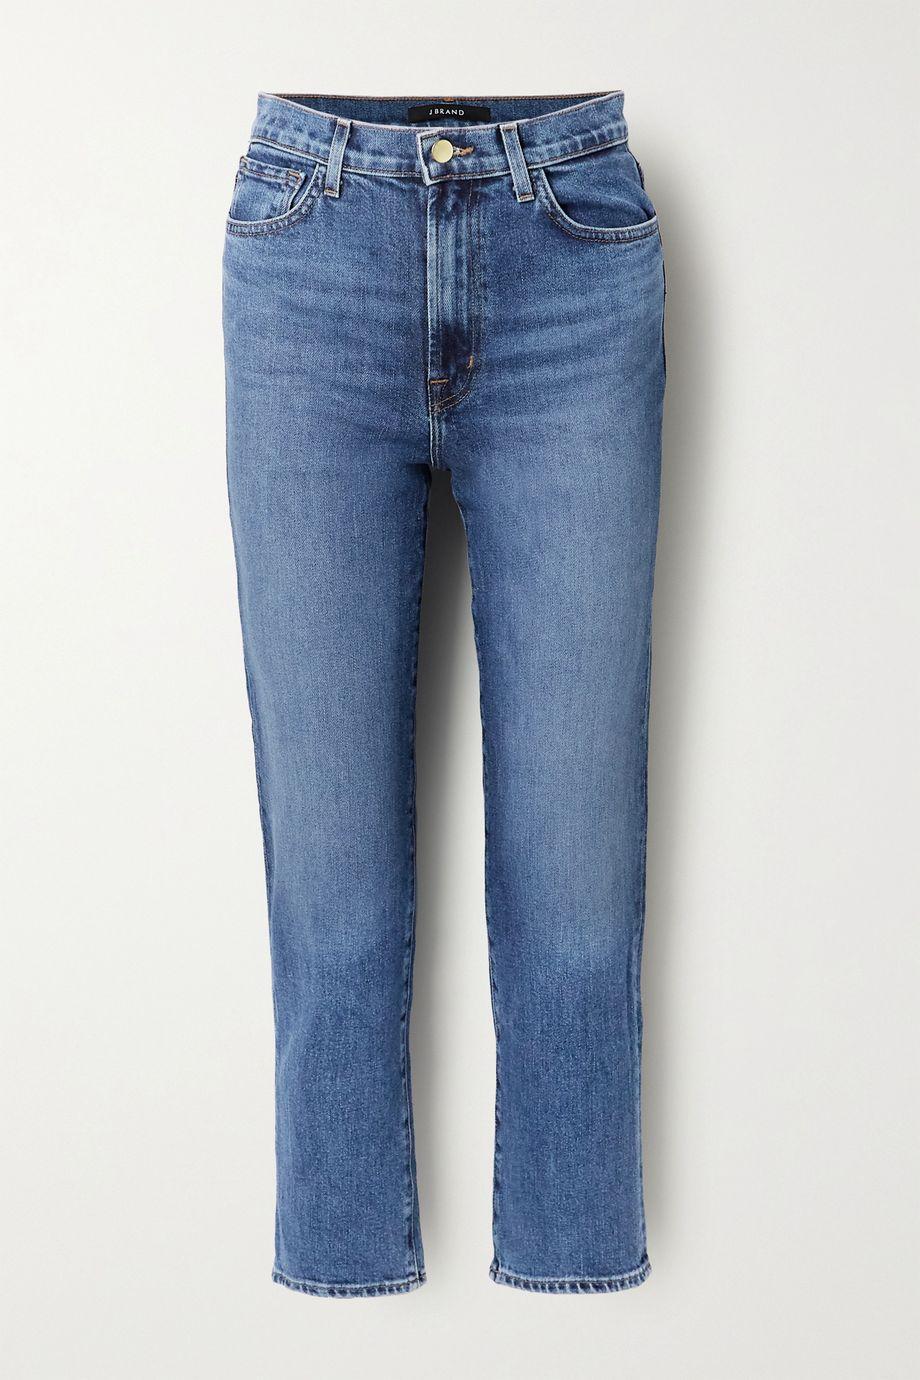 J Brand Jules high-rise straight-leg jeans